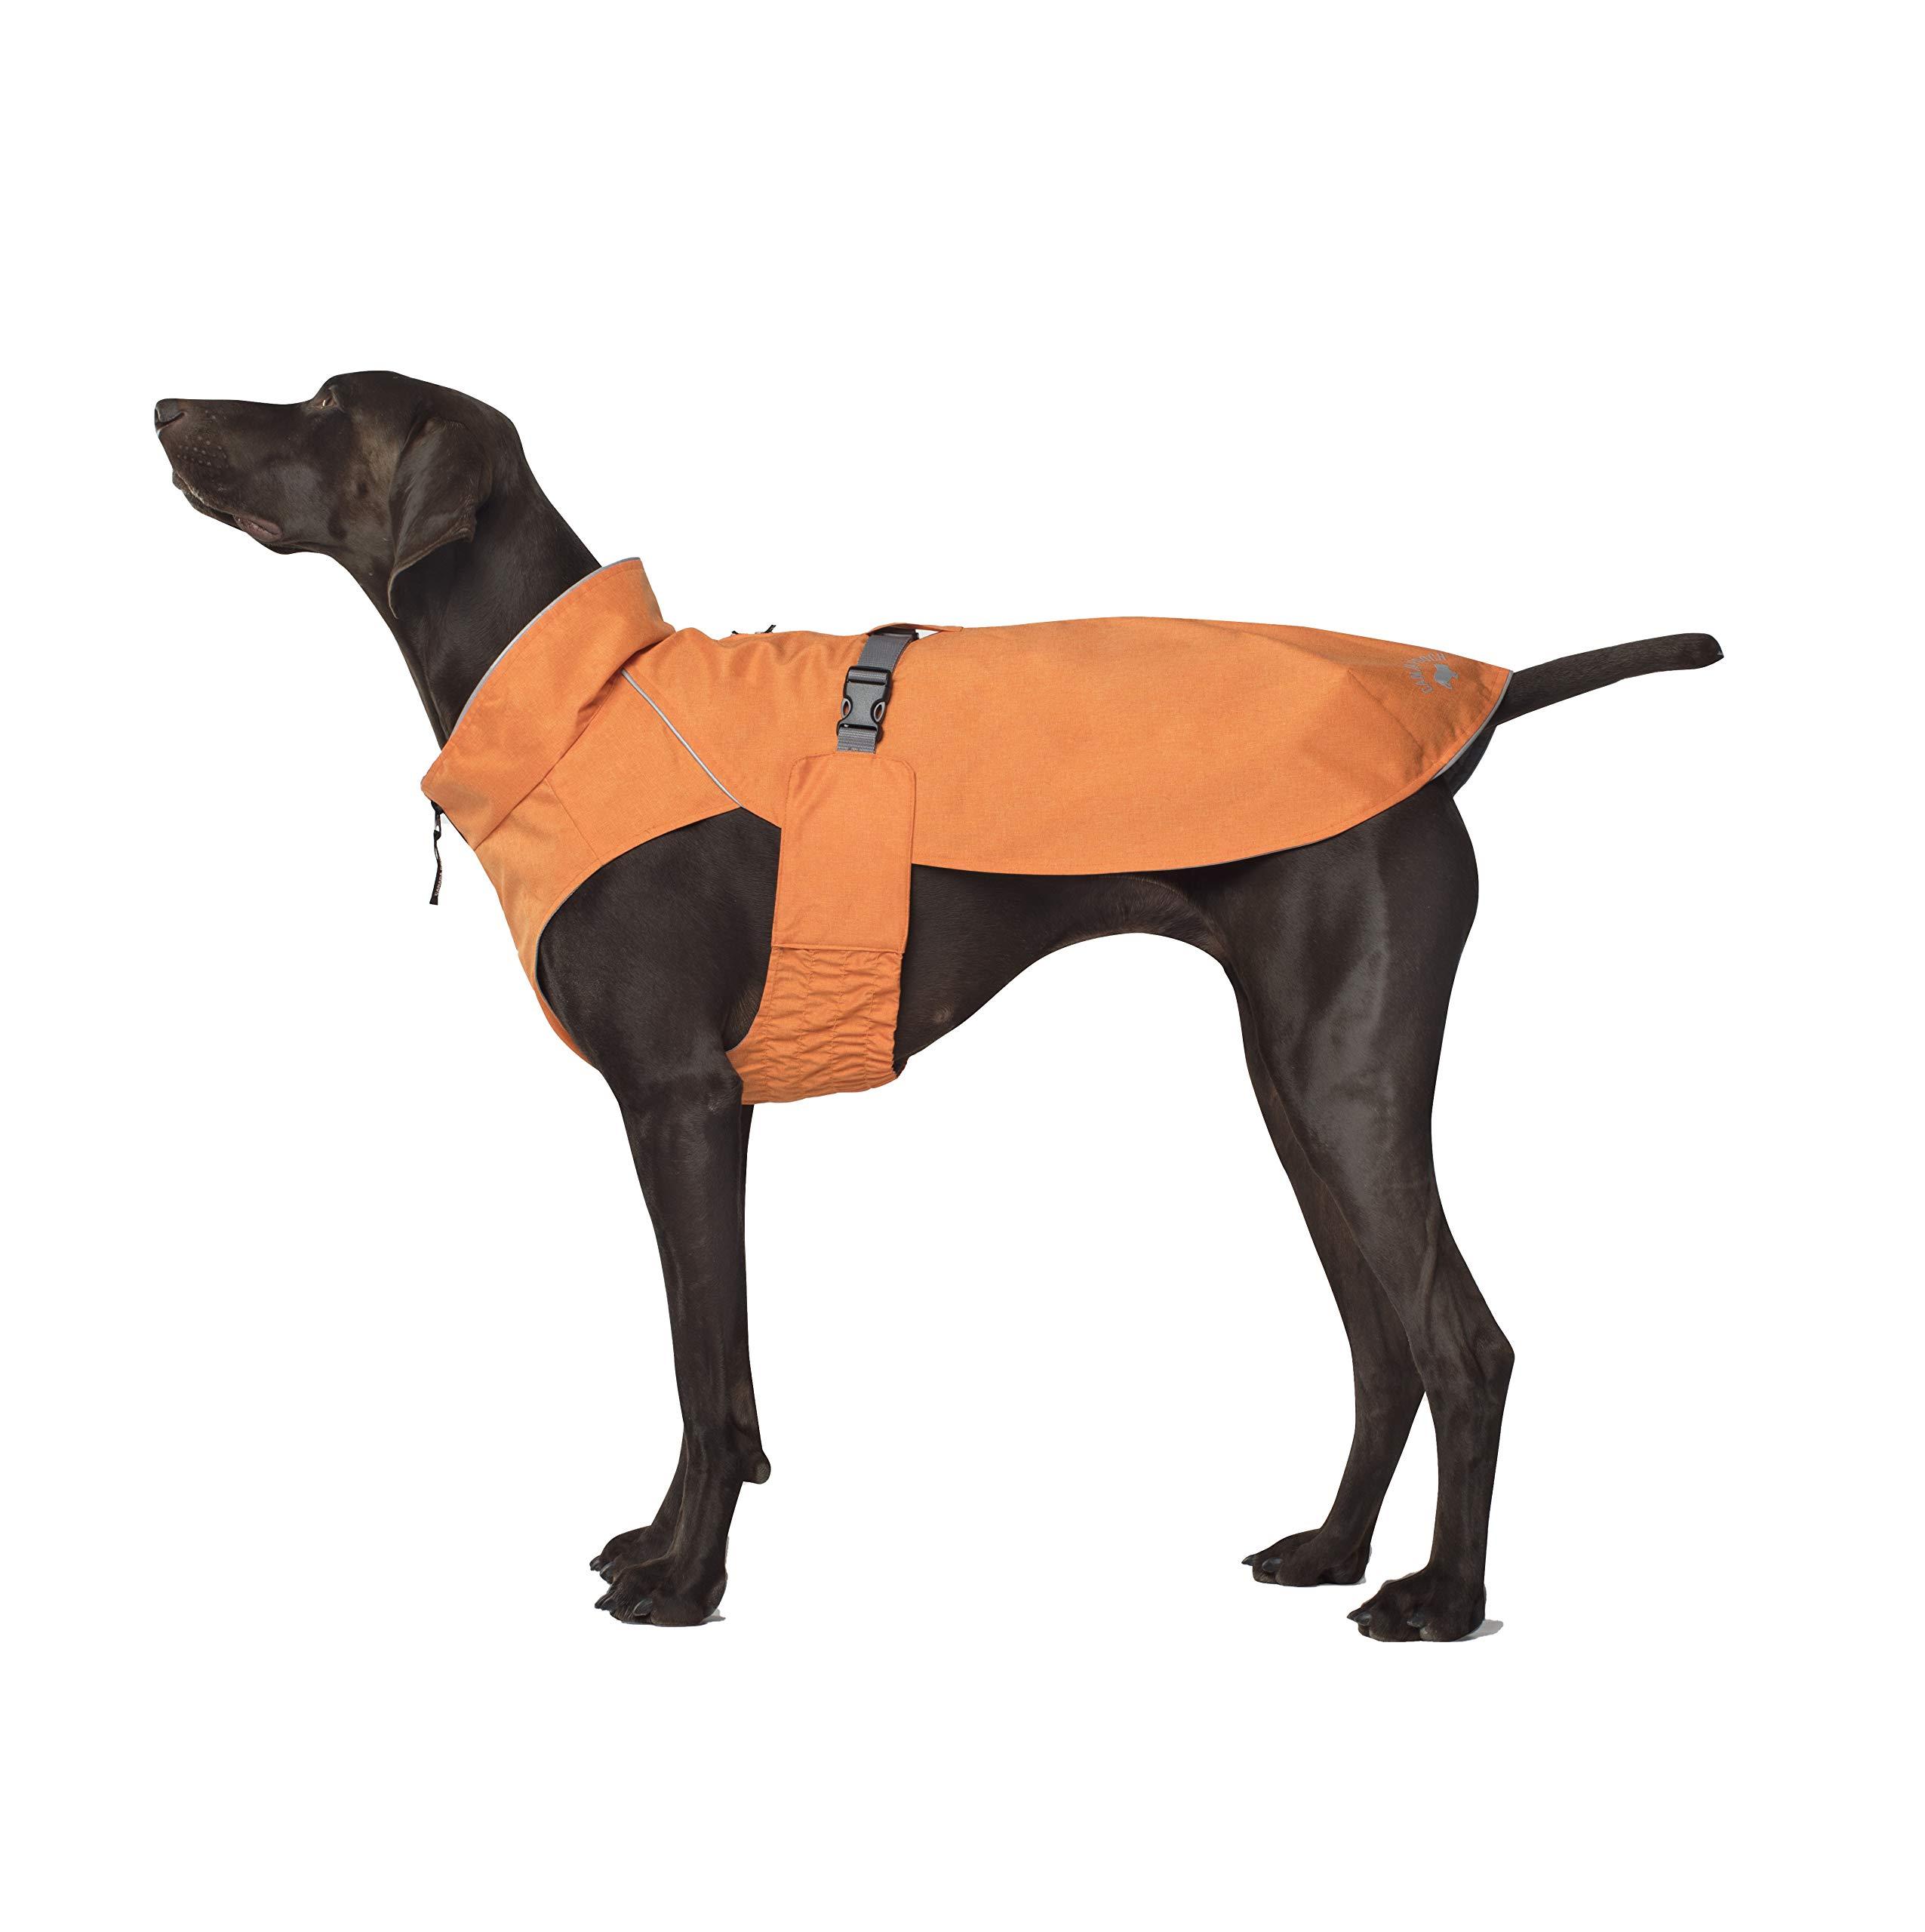 Canada Pooch The Expedition Raincoat, Orange, Size 28